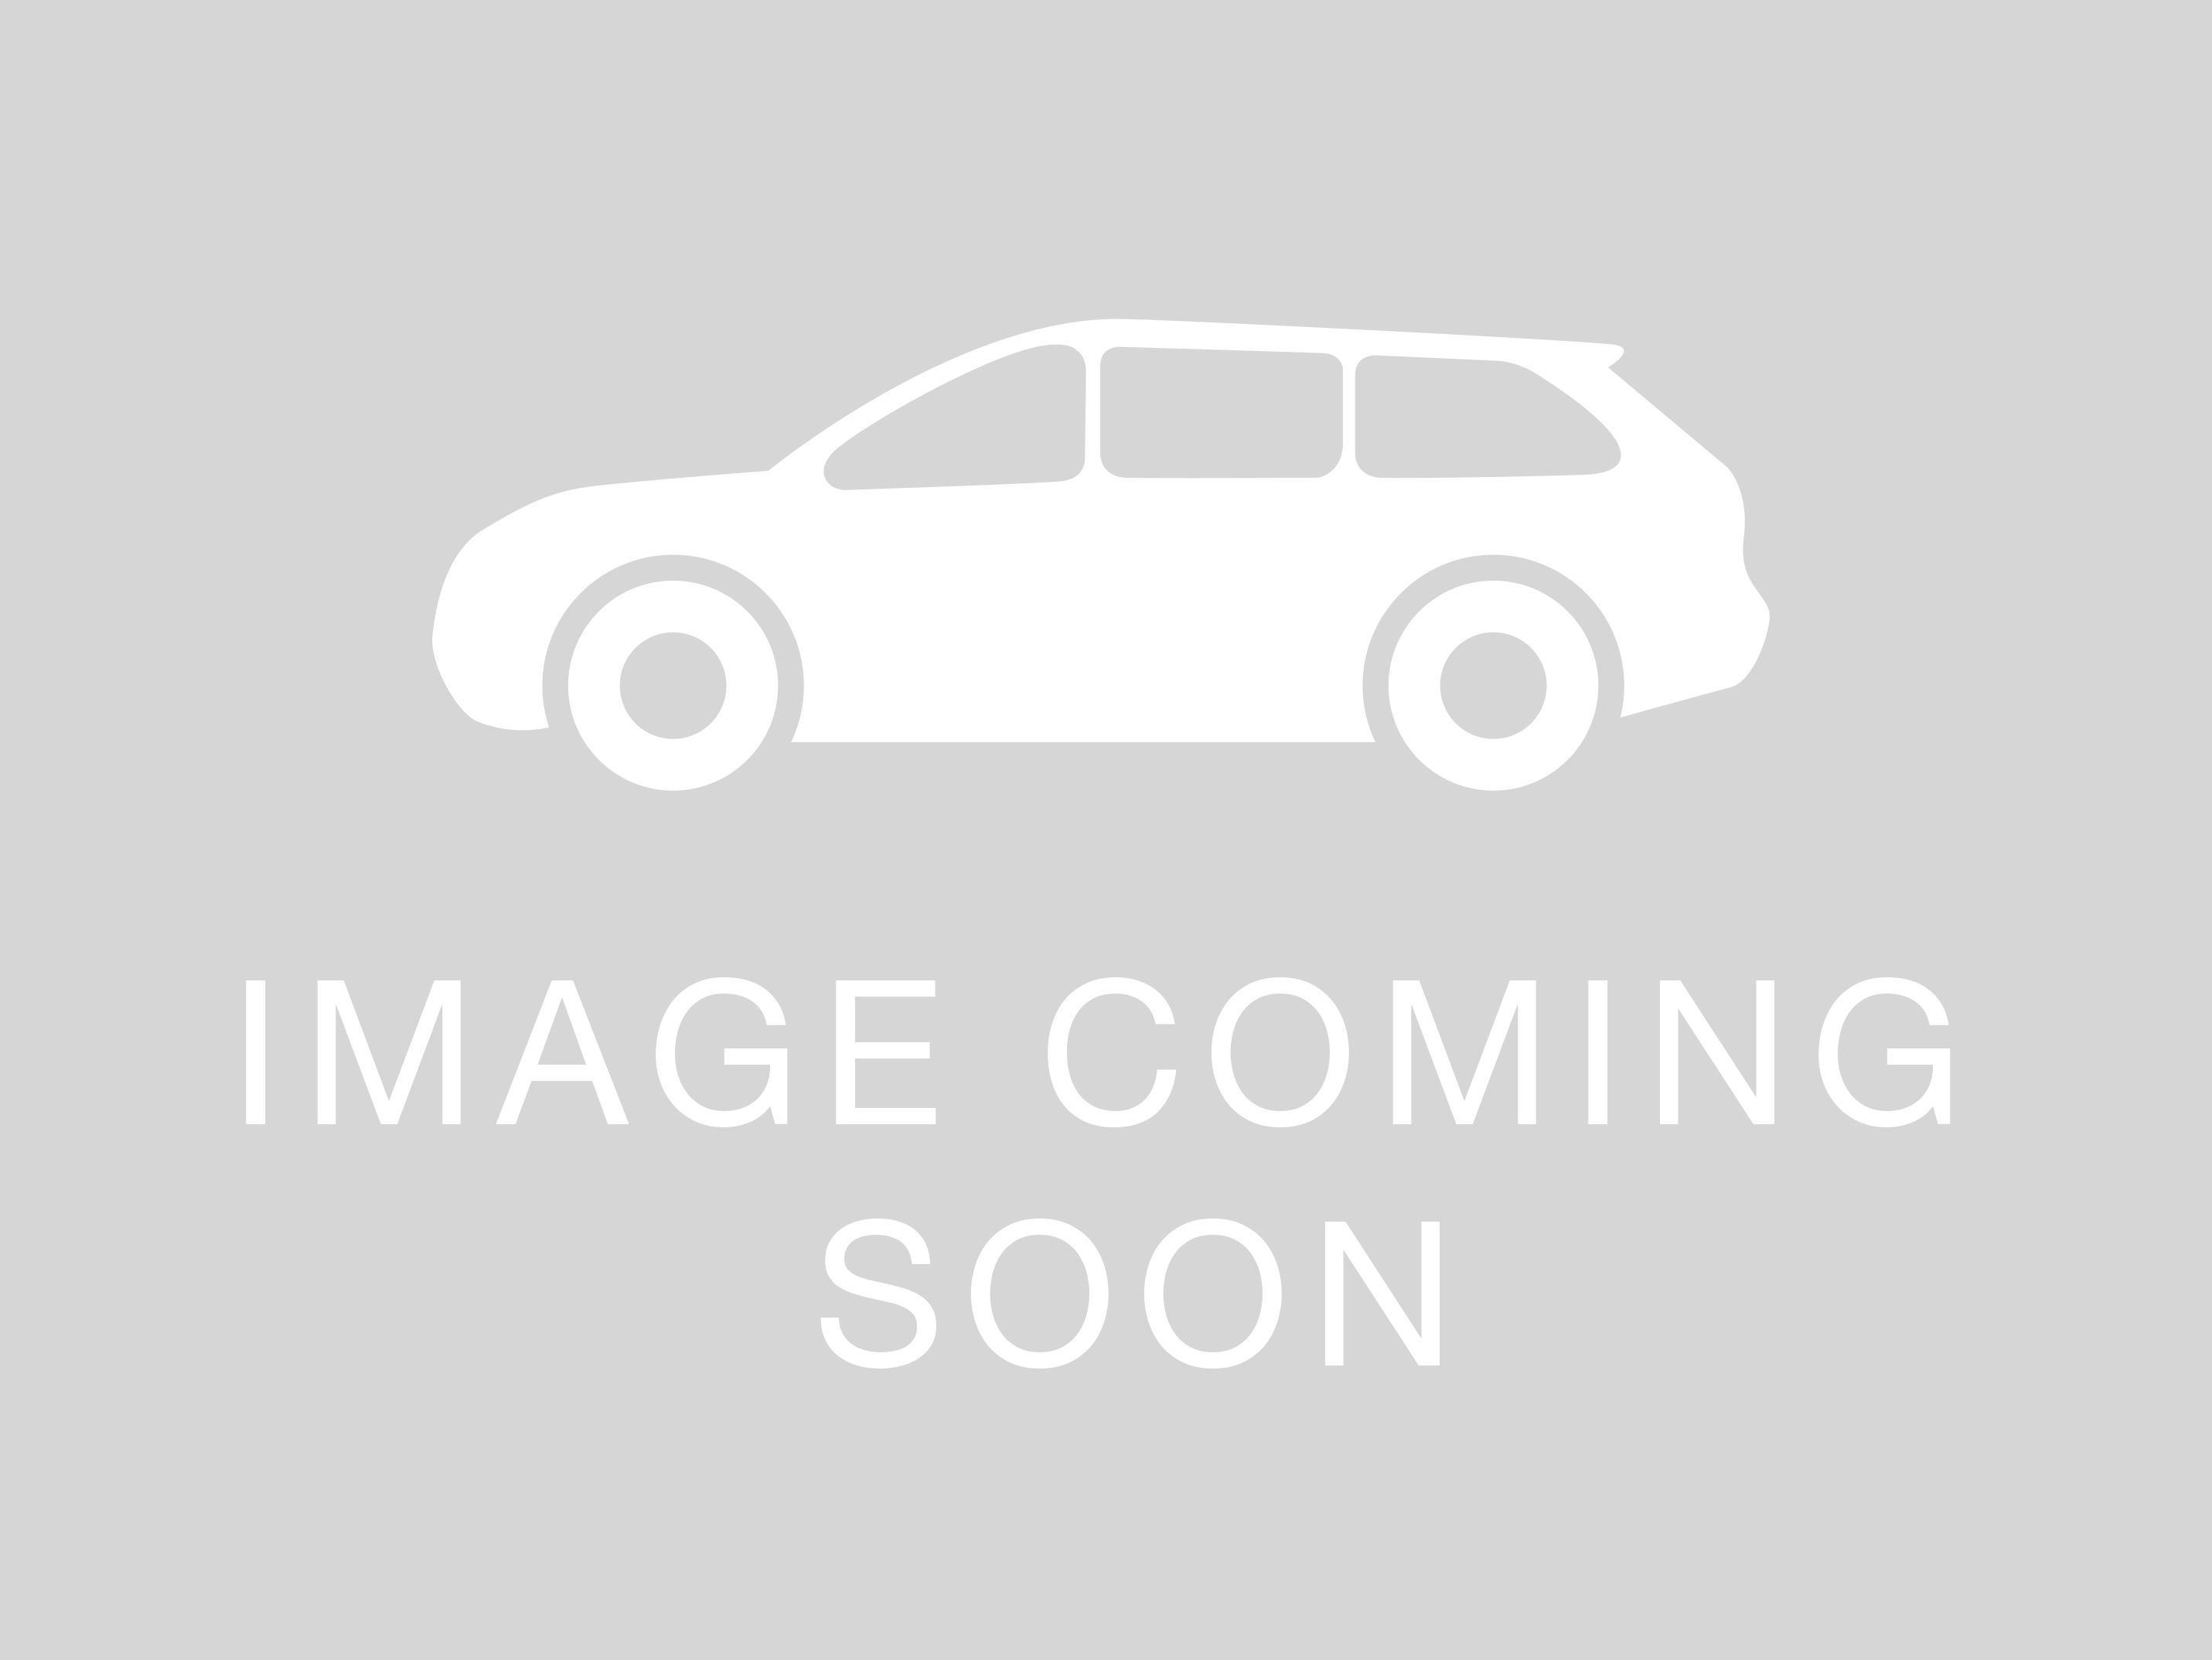 Used Hyundai 2018 Kona 1.6L Turbo AWD | East Auckland ...